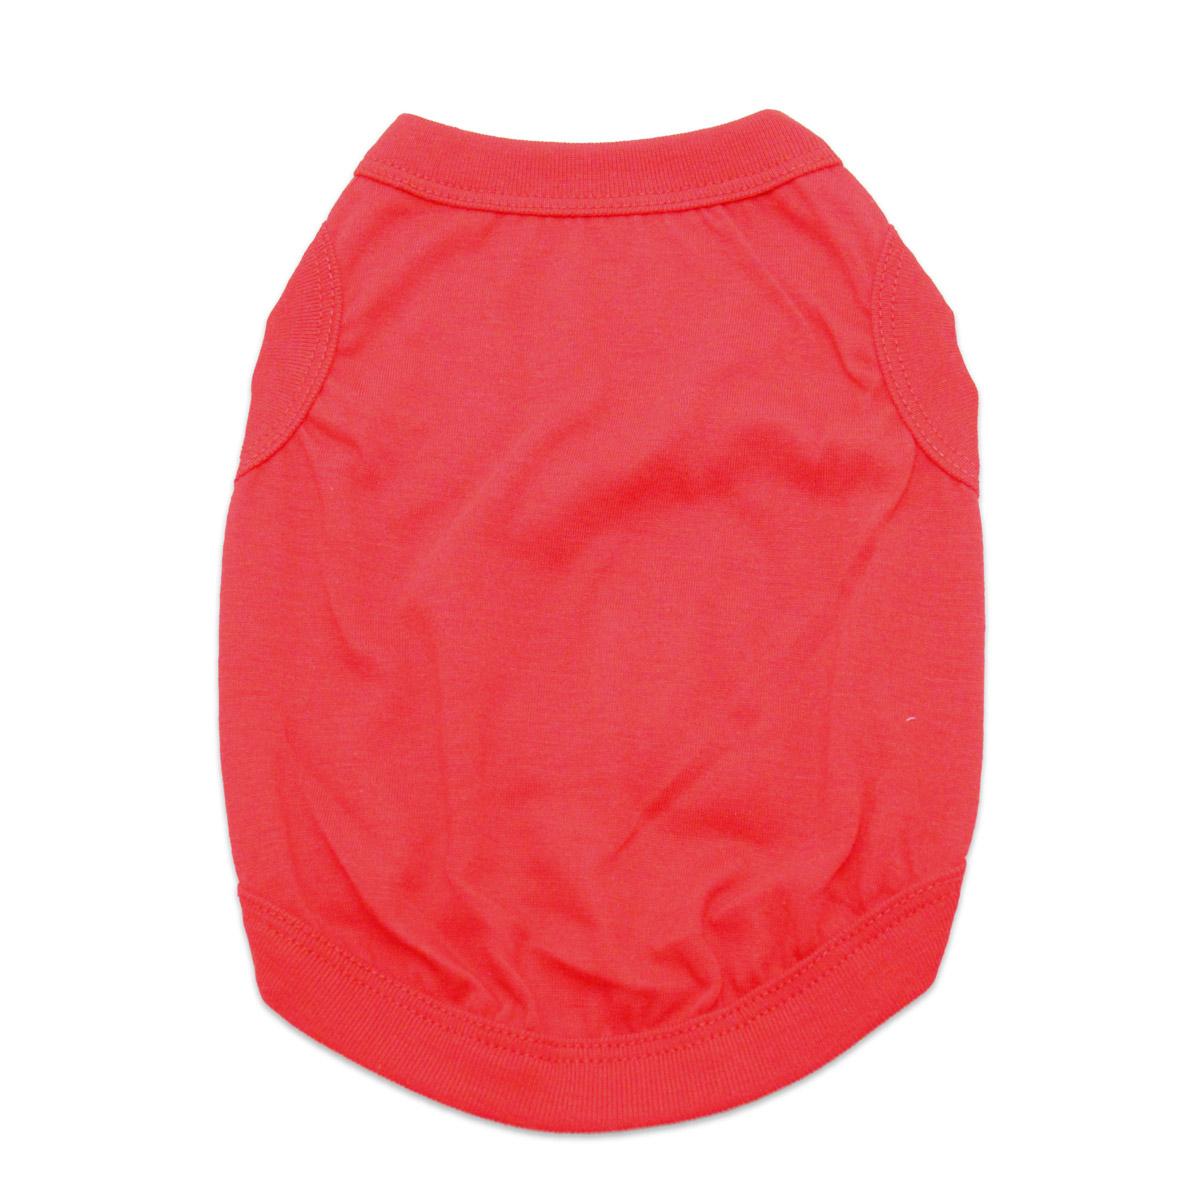 Barking Basics Dog Tank Shirt - Red